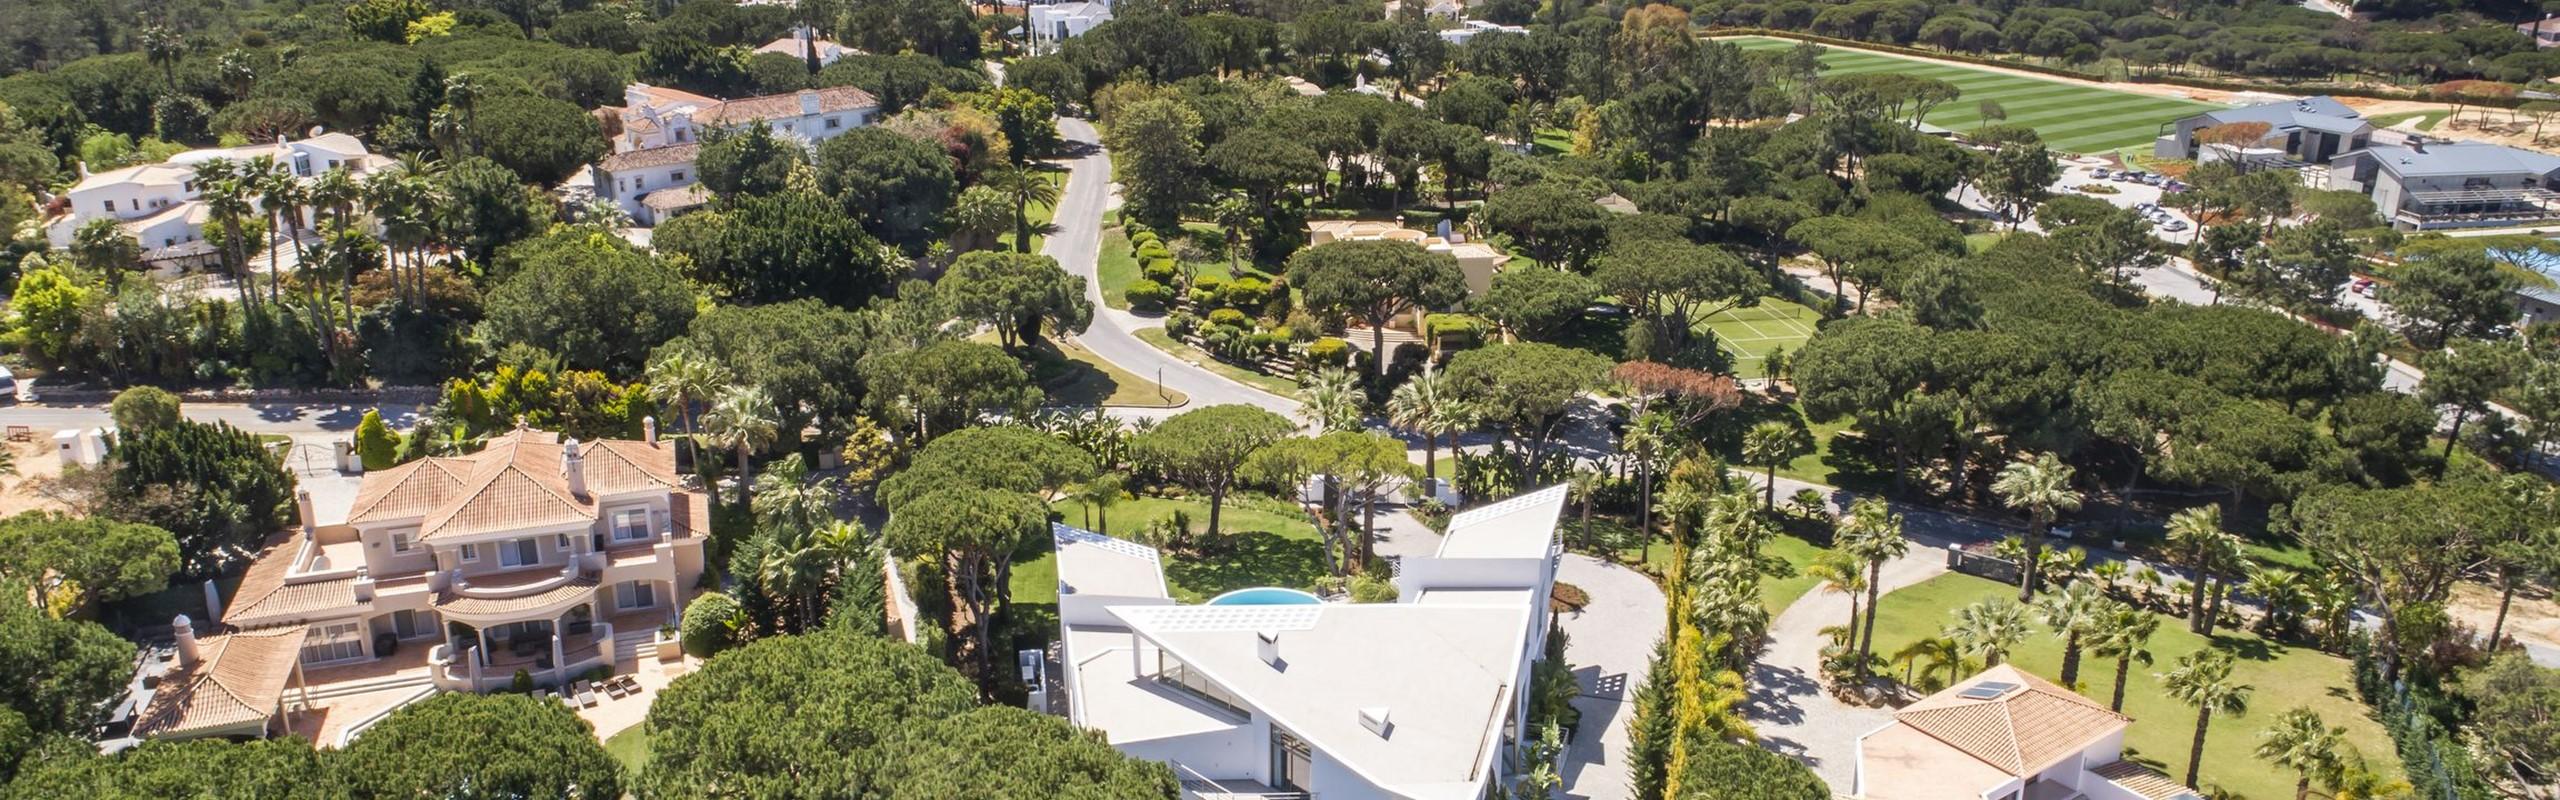 Quinta Do Lago Villa To Remt Near The Campus